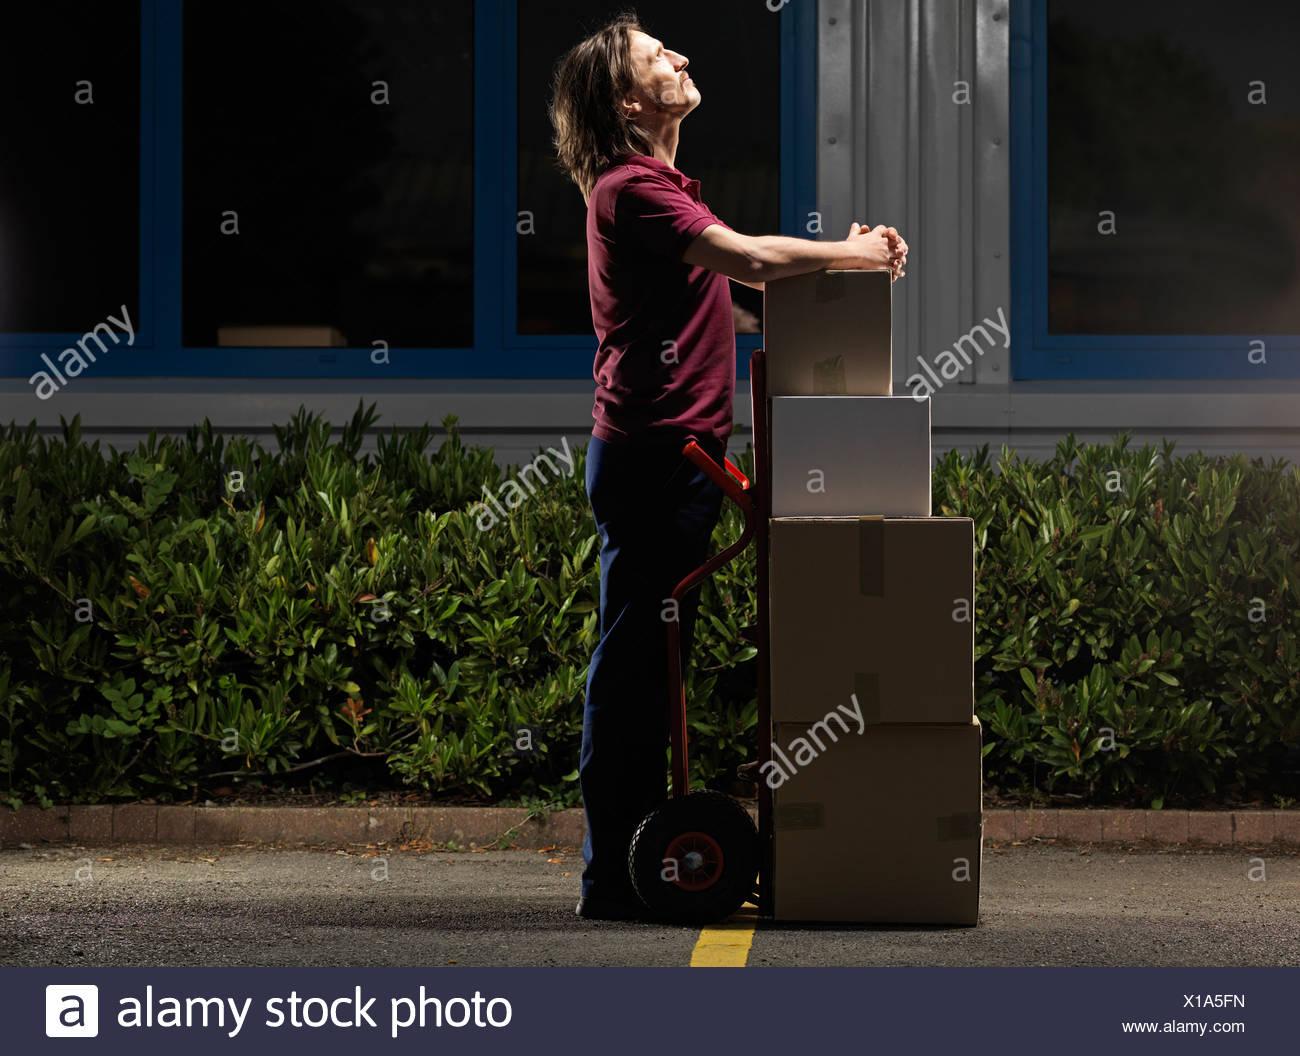 man moving boxes at night - Stock Image